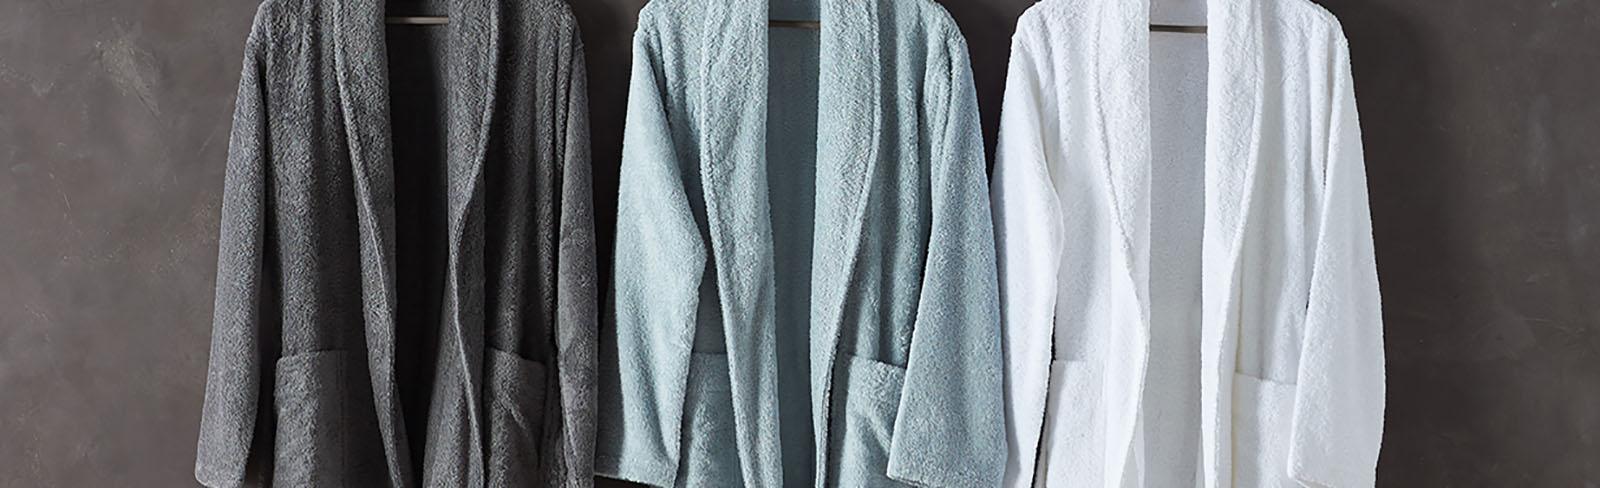 2135502f0f Organic Cotton Bathrobes - Bamboo Robes